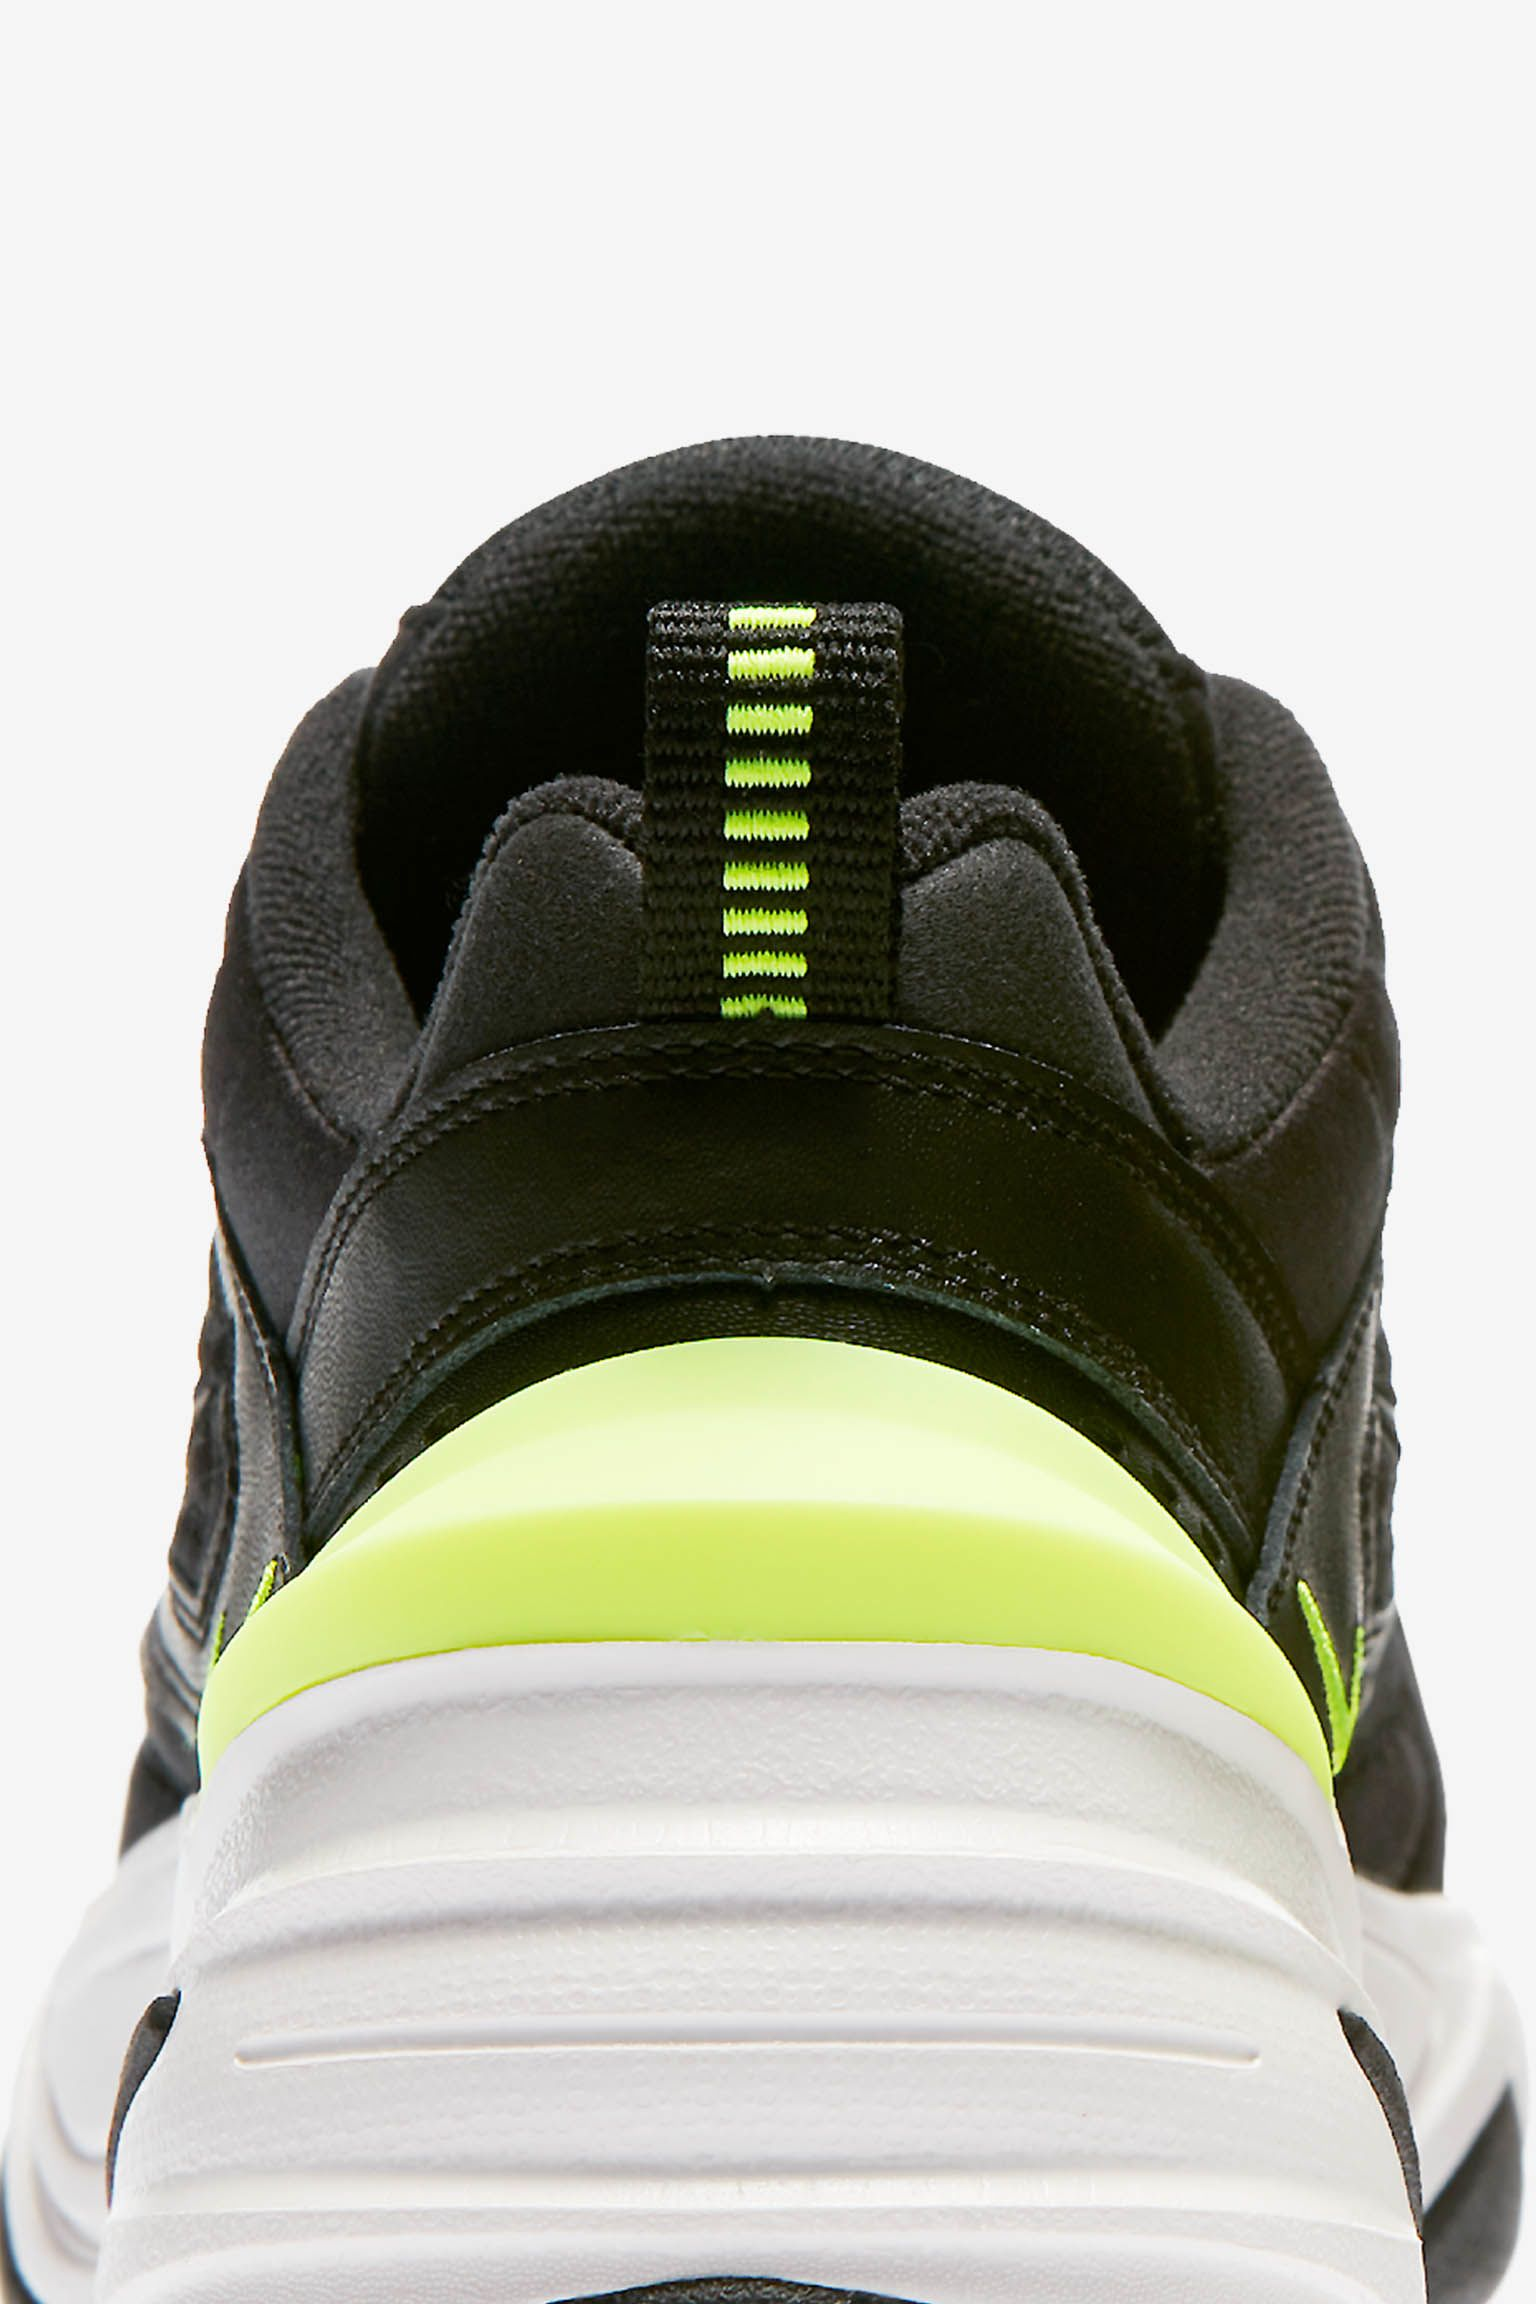 Nike Women's M2K Tekno 'Black & Volt' Release Date